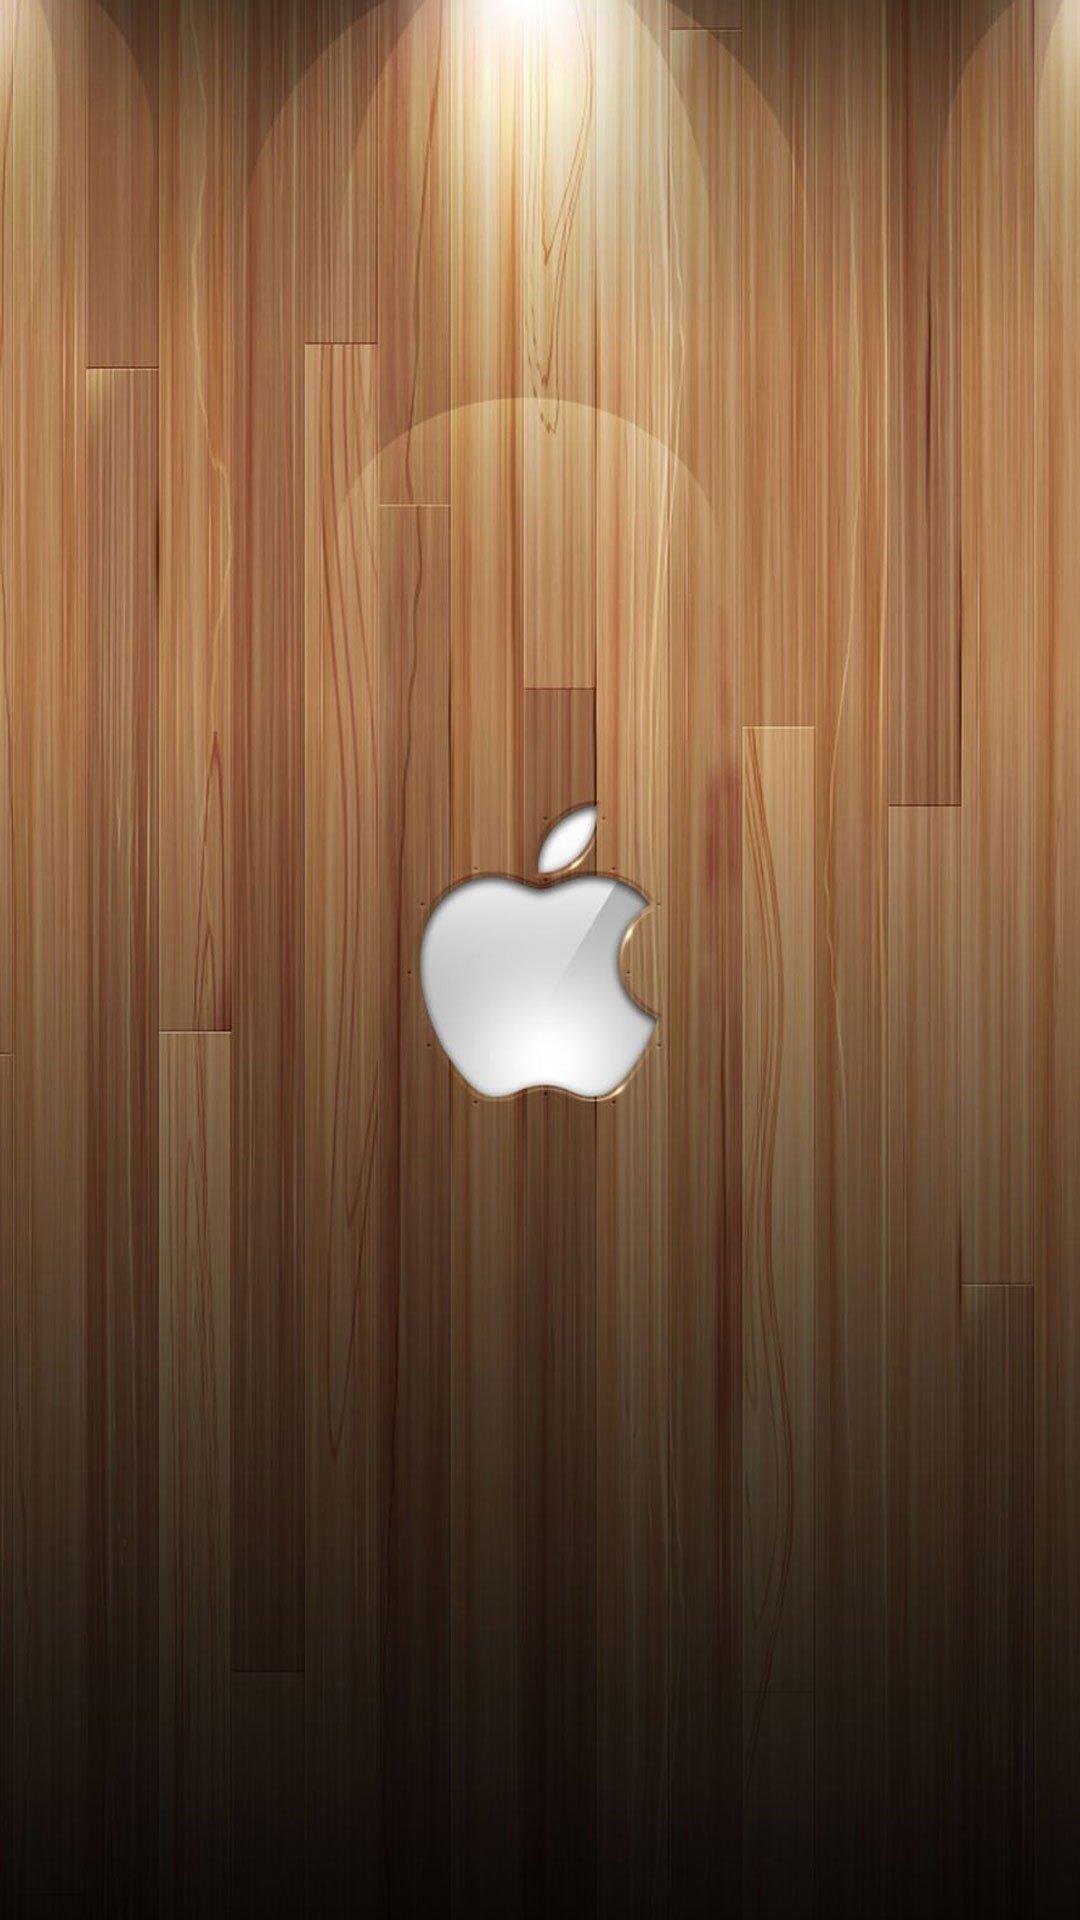 ... /uploads/2014/09/Beautiful-Apple-iPhone-6-Plus-Wallpaper-Retina1.jpg